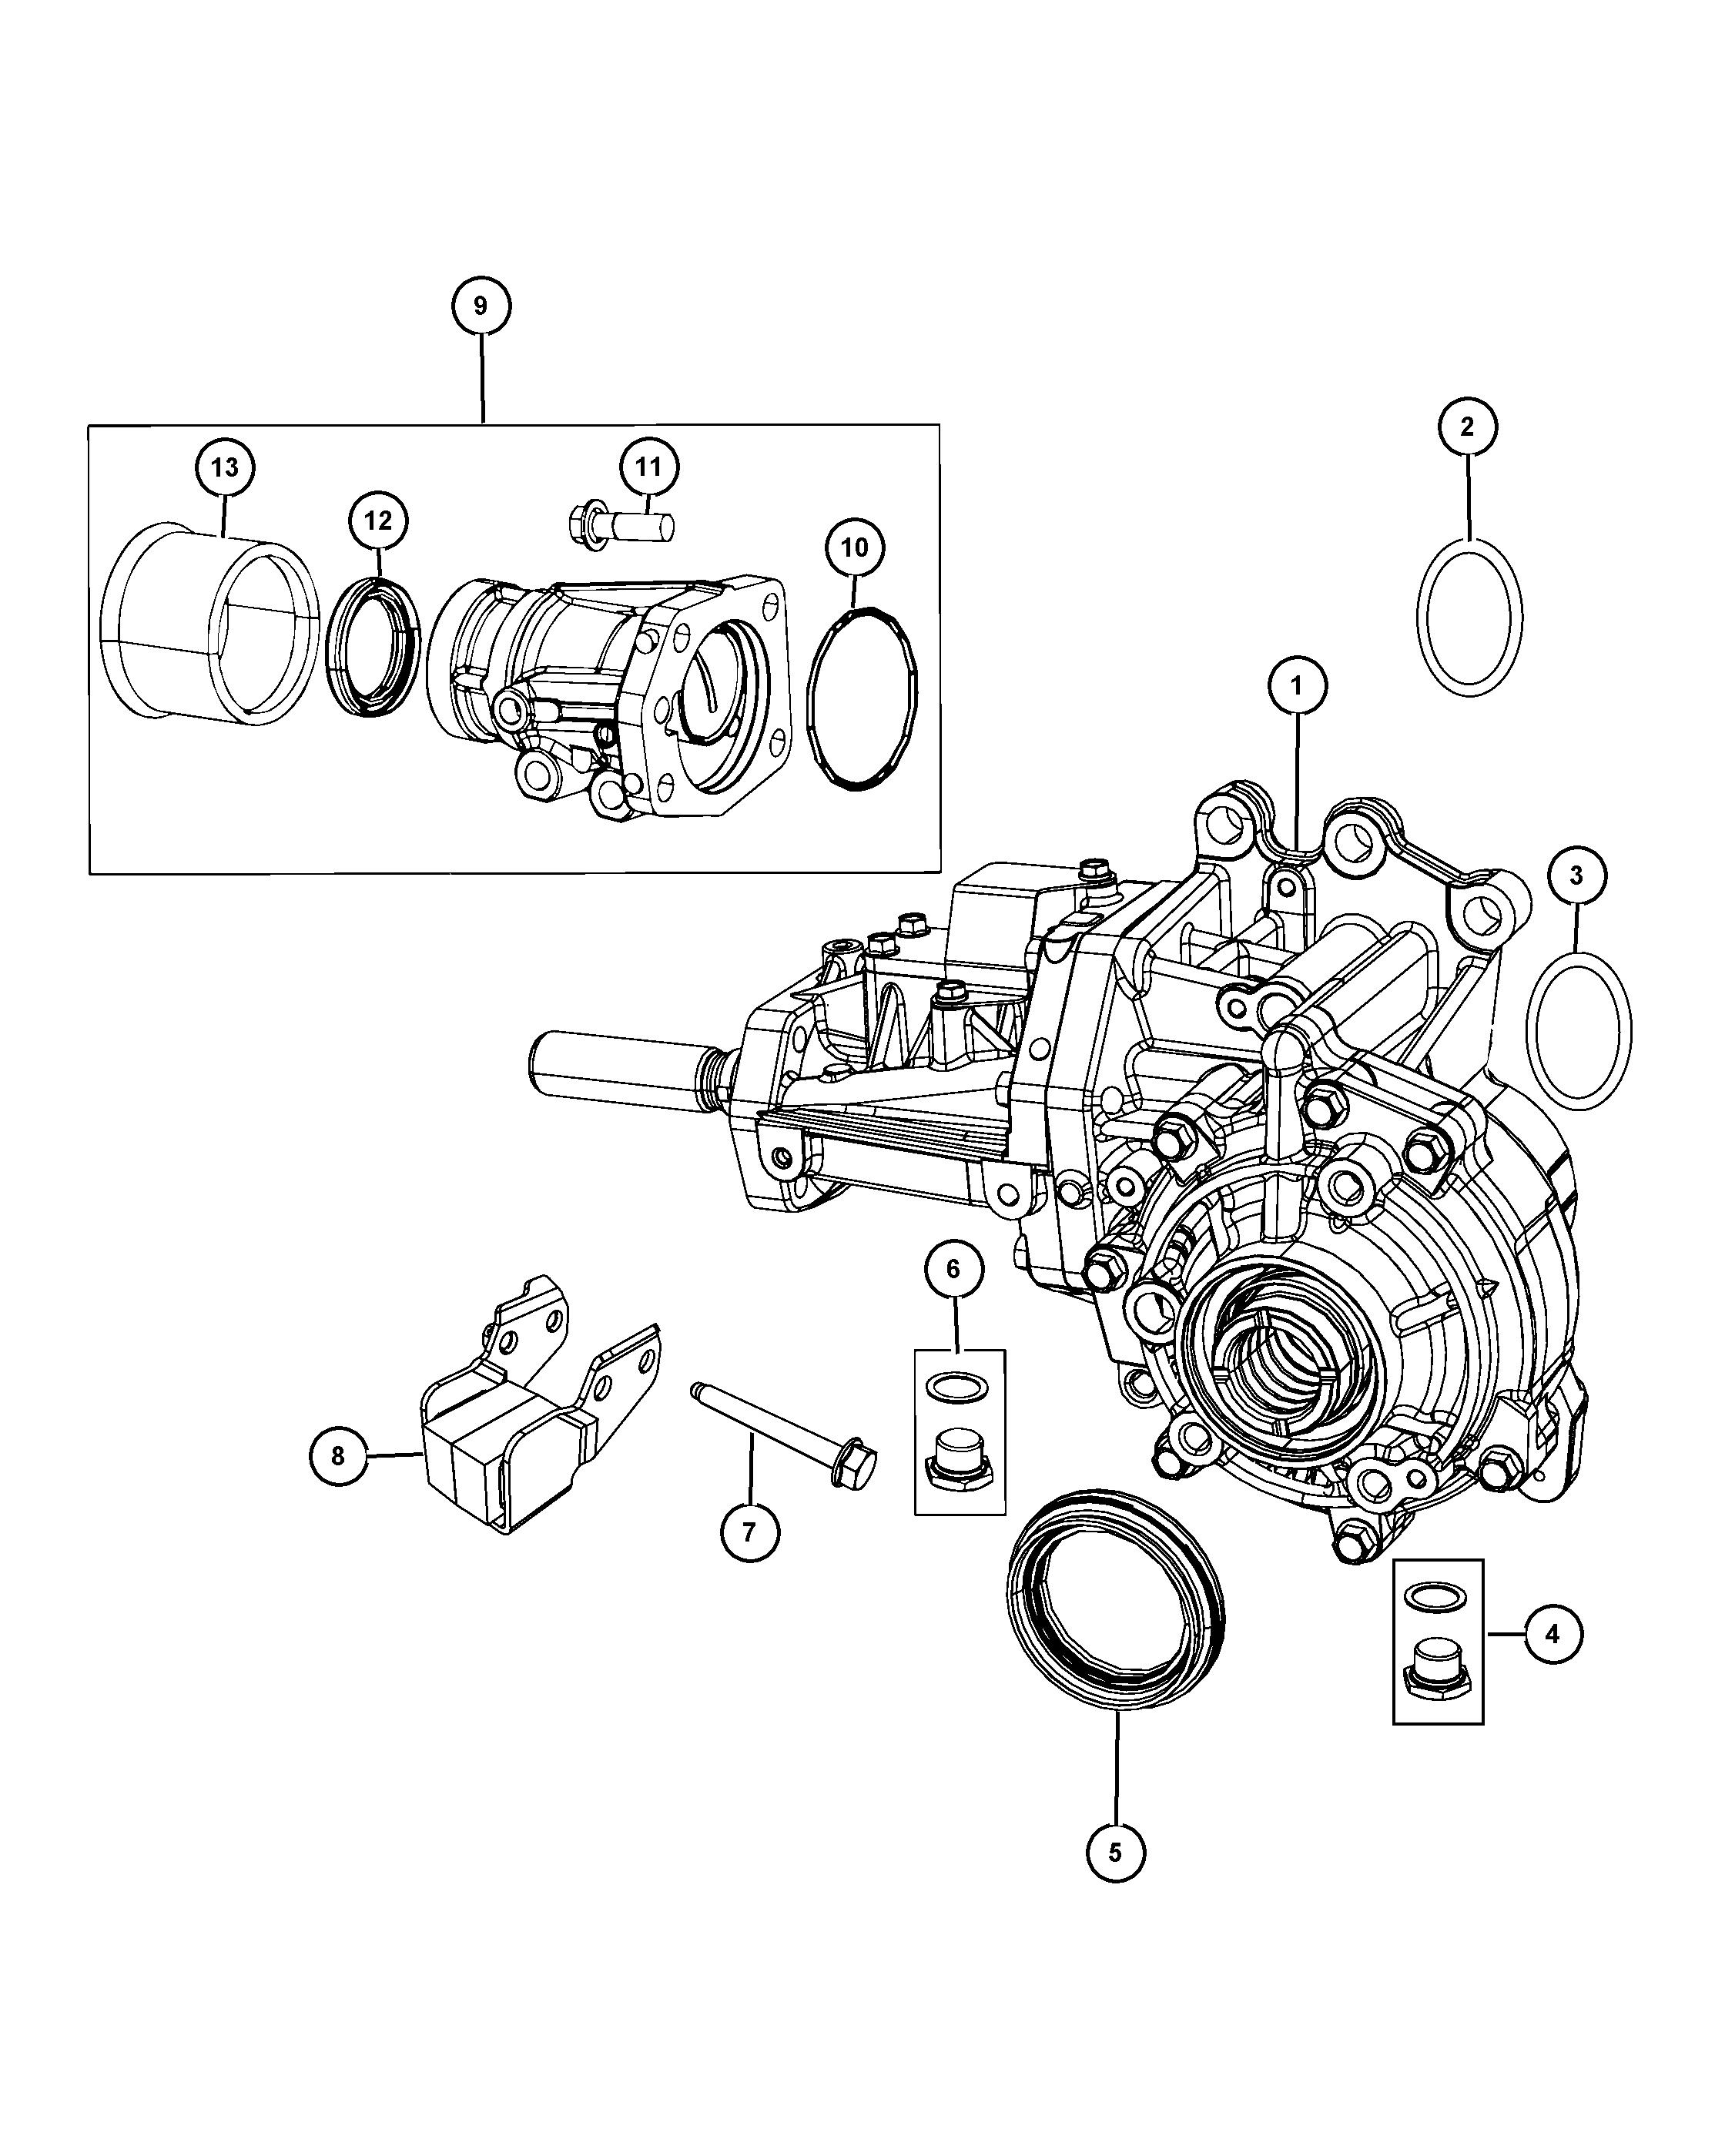 jeep mk diagram wiring diagram Excalibur Wiring Diagrams jeep mk diagram 2 2 petraoberheit de u2022jeep mk diagram online wiring diagram rh 3